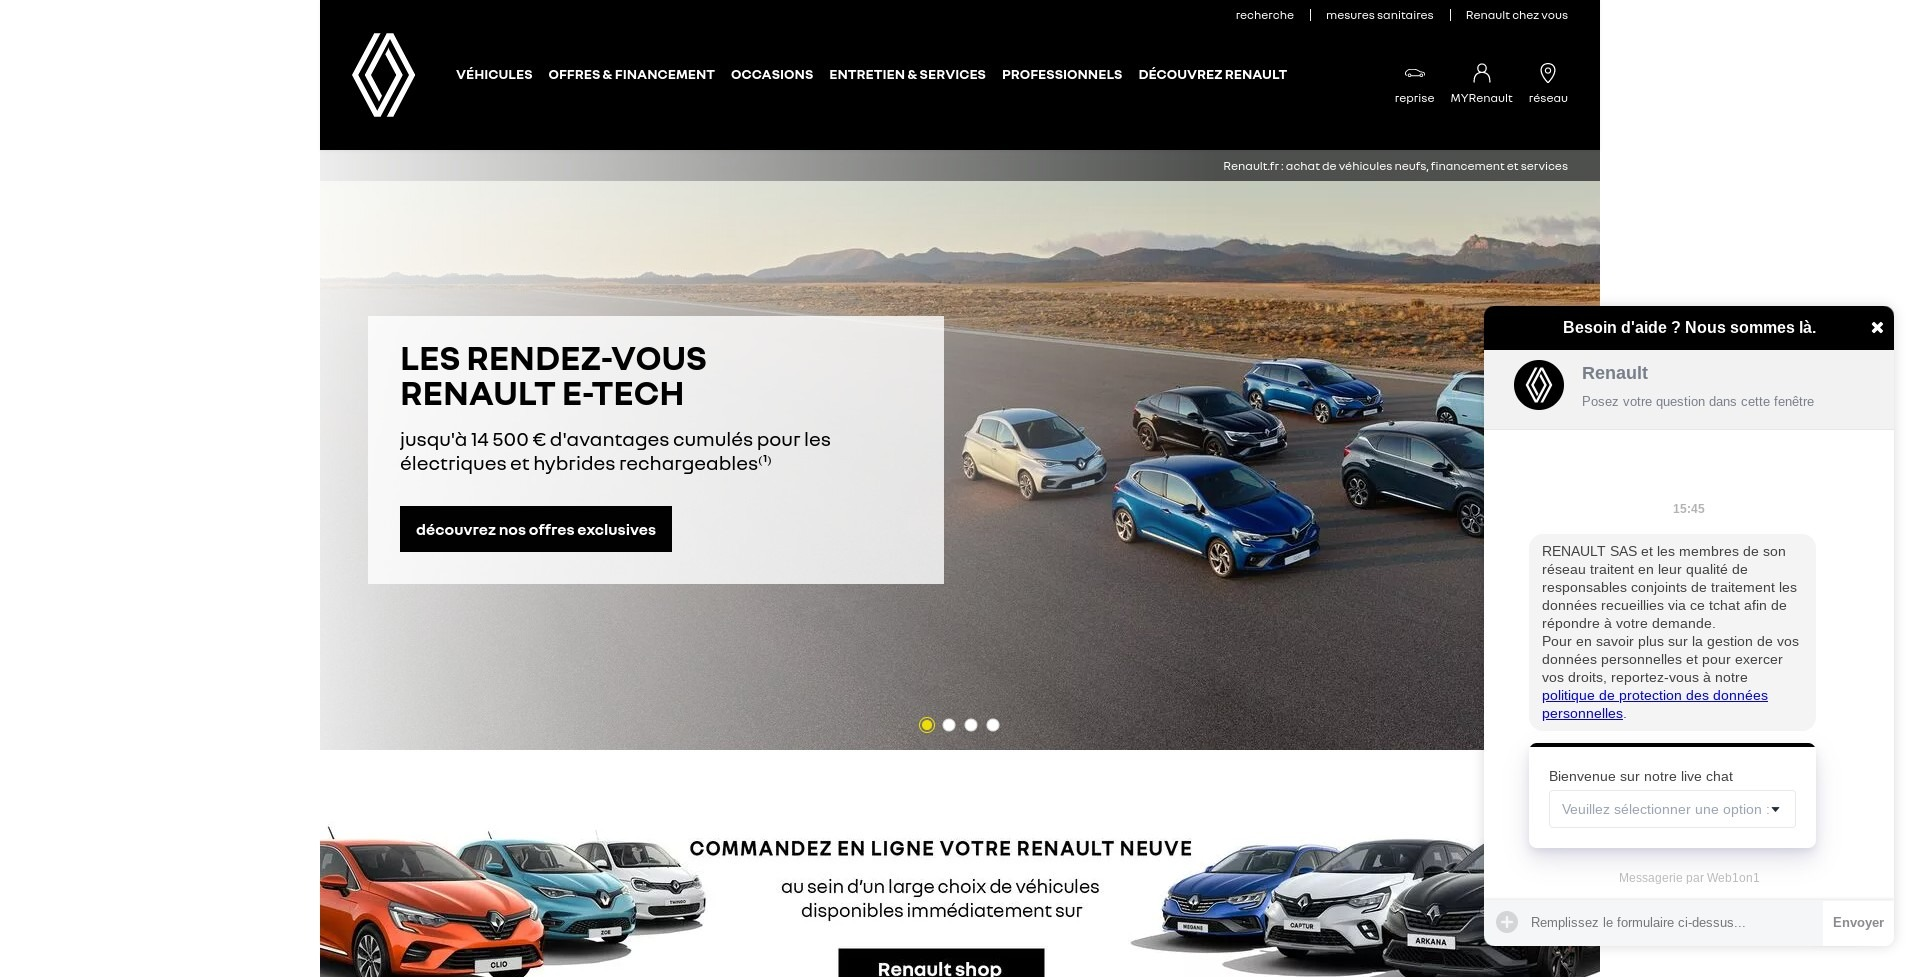 Live chat on Renault France